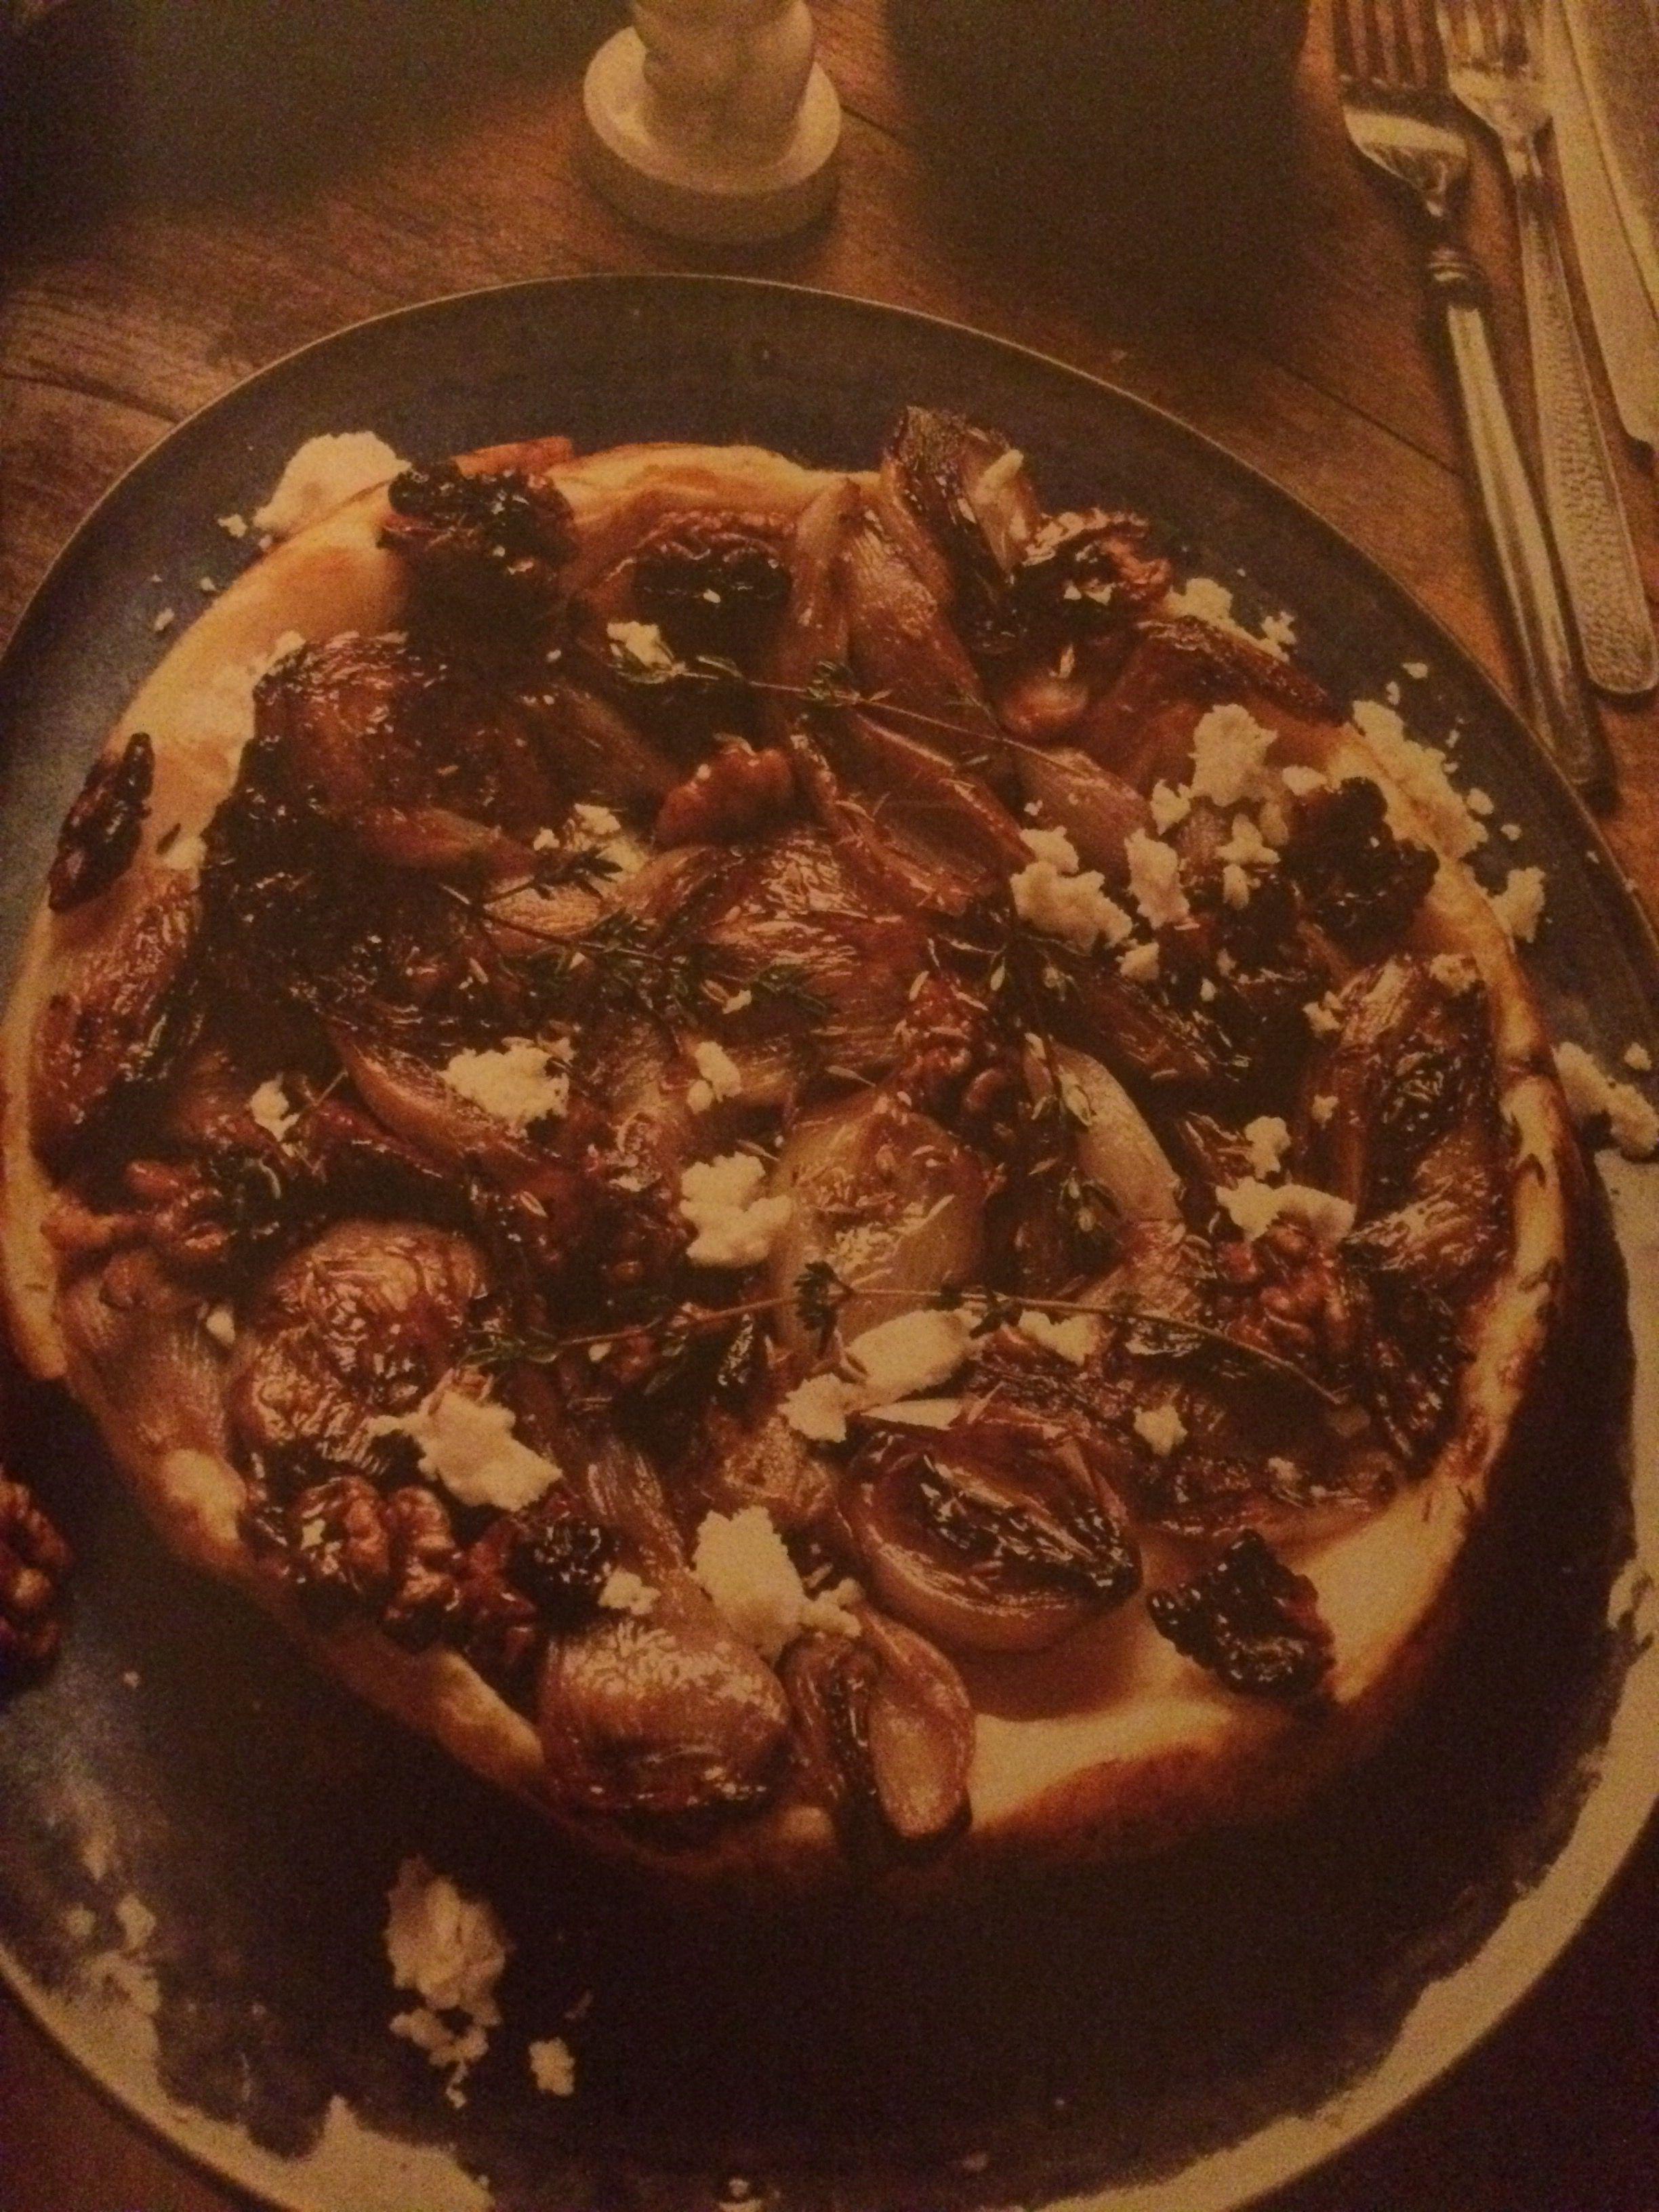 Tarte tatin van sjalotten en walnoten.  Elle eten, januari 2016